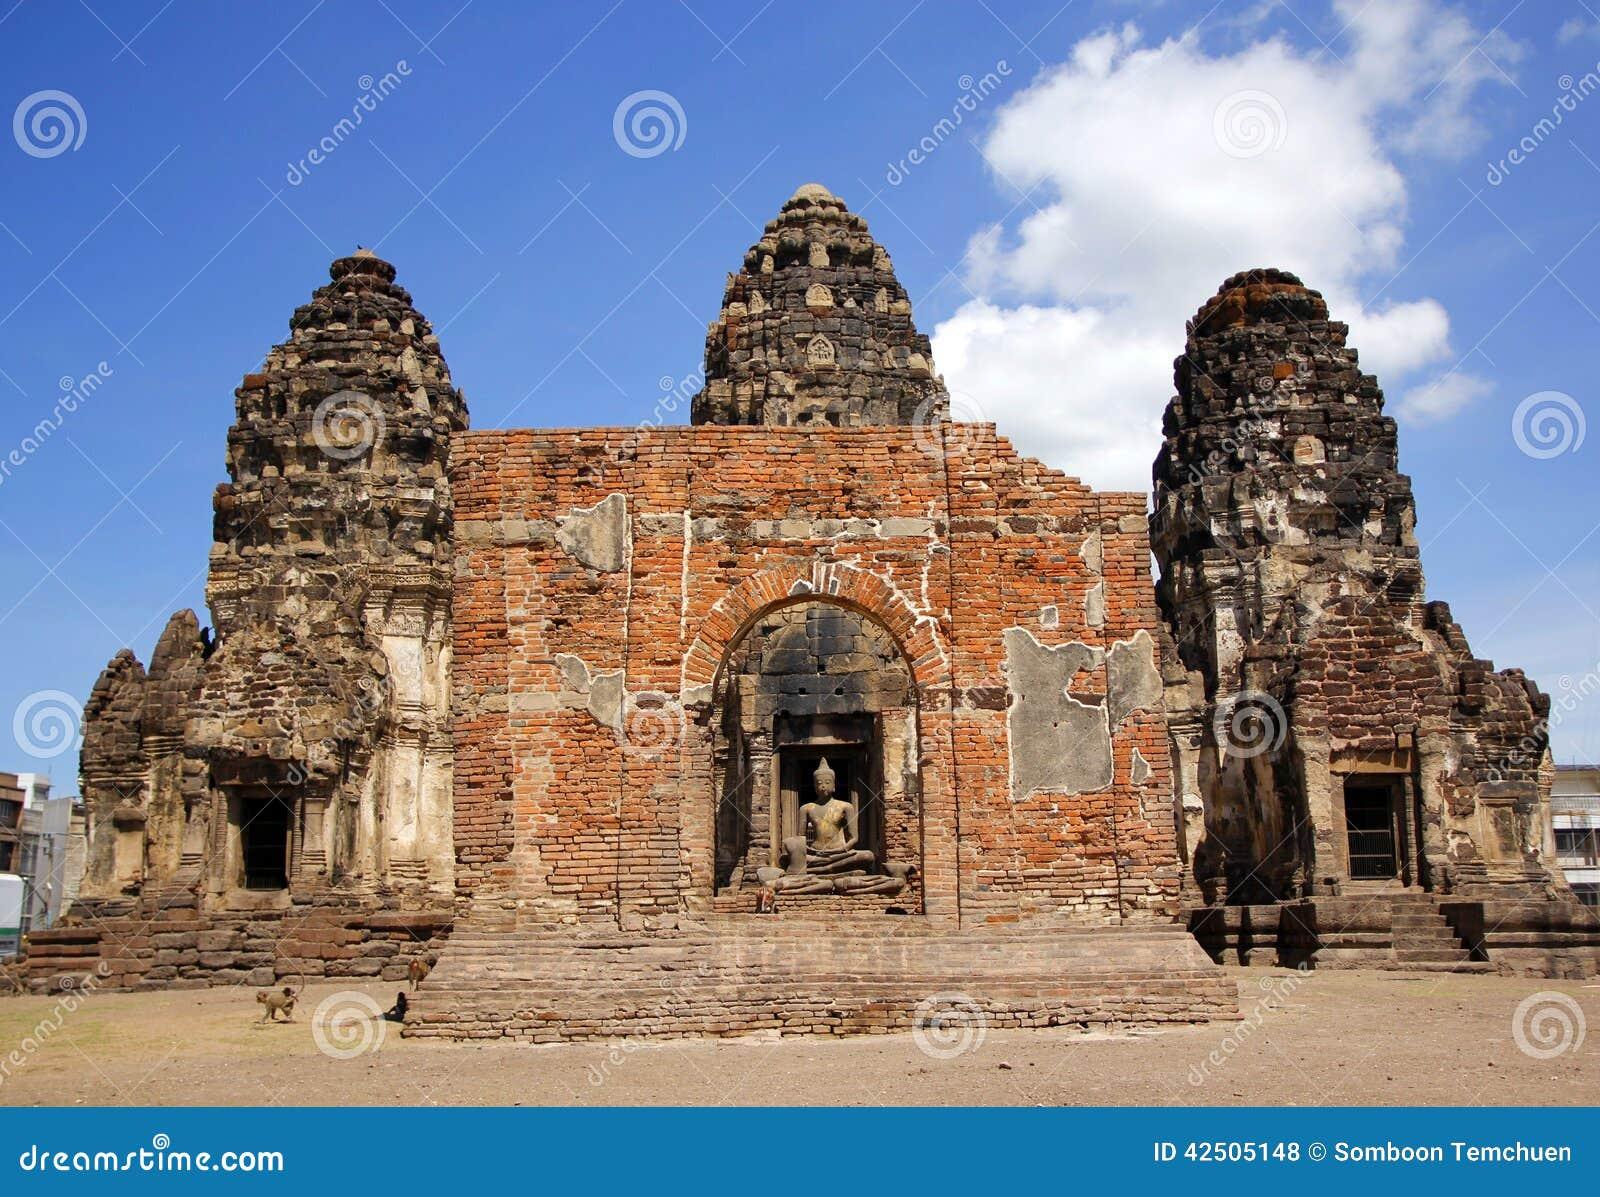 Phra Prang Sam Yot Stock Photo - Image: 42505148